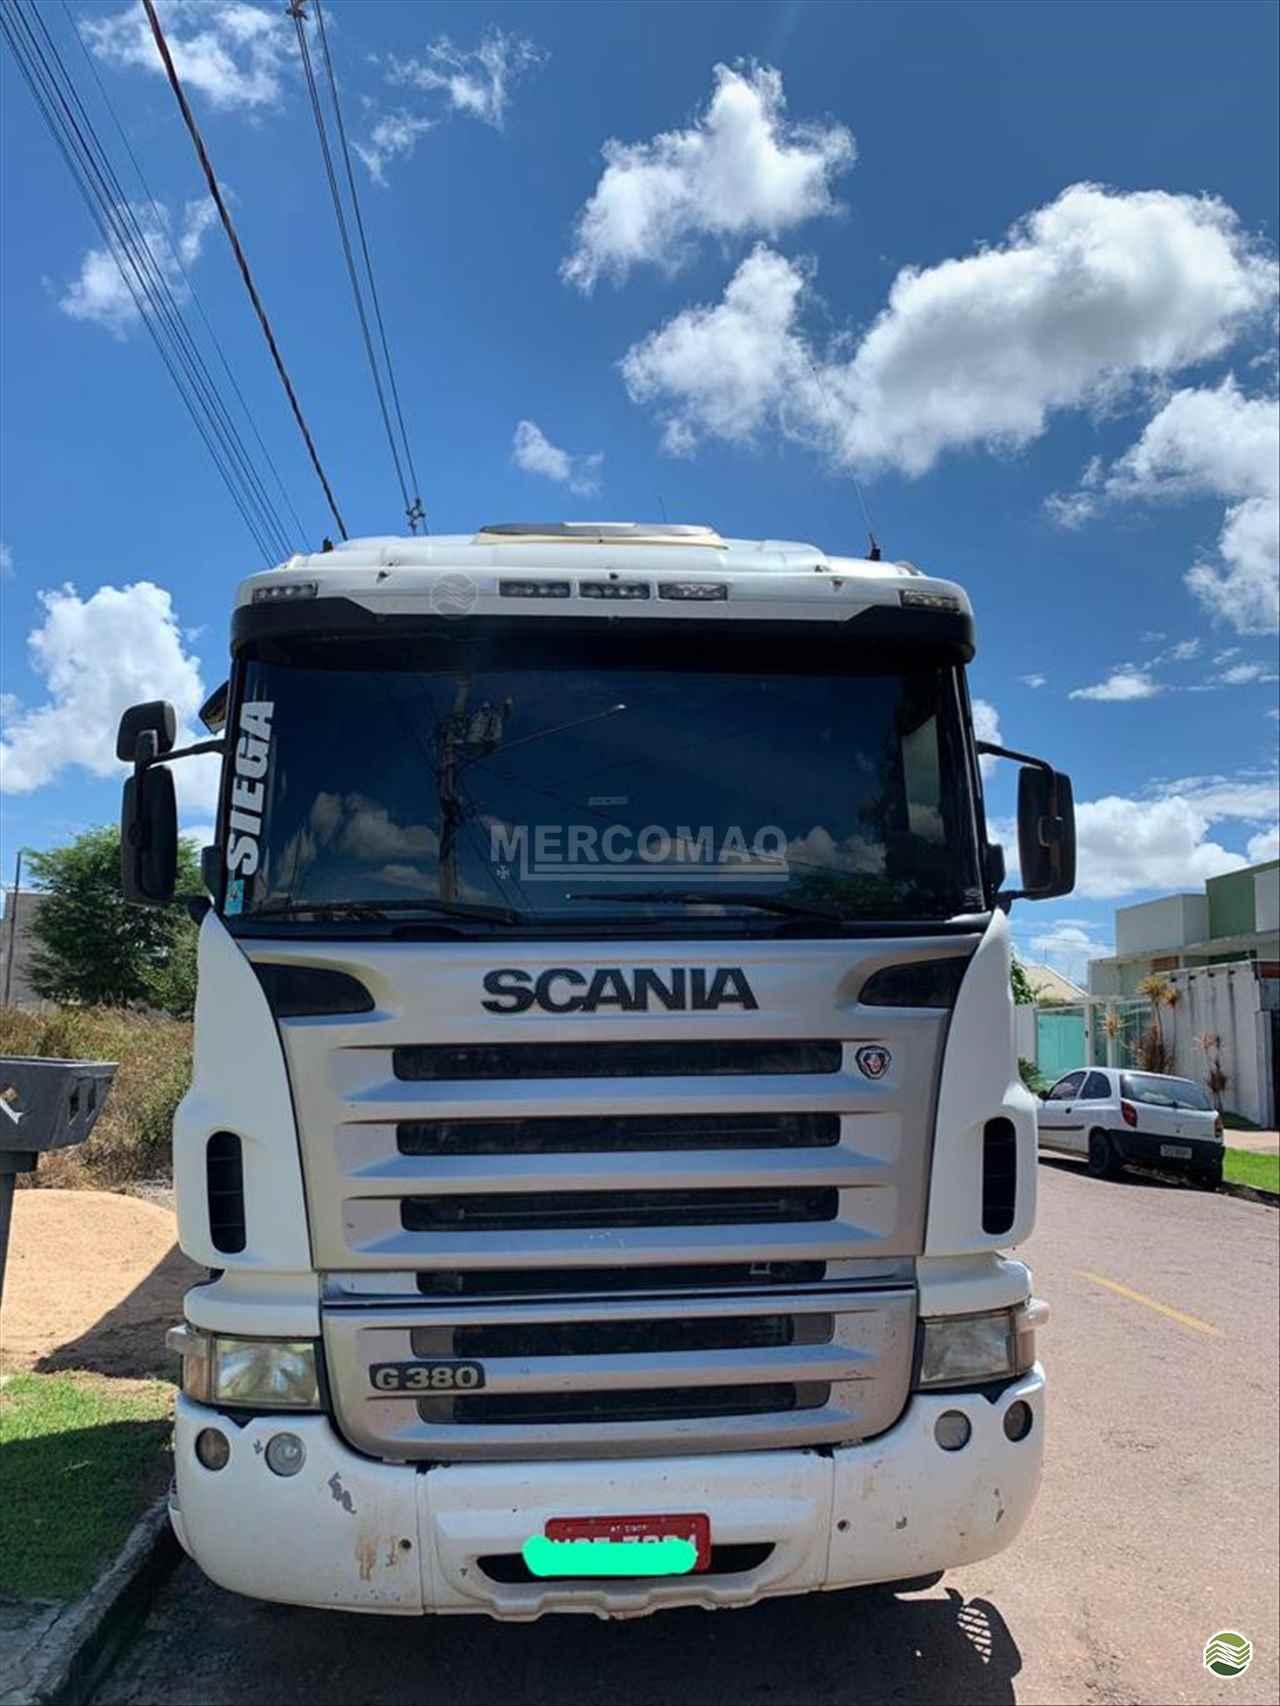 CAMINHAO SCANIA SCANIA 380 Graneleiro Truck 6x2 Mercomaq - JAN - GTS PRIMAVERA DO LESTE MATO GROSSO MT